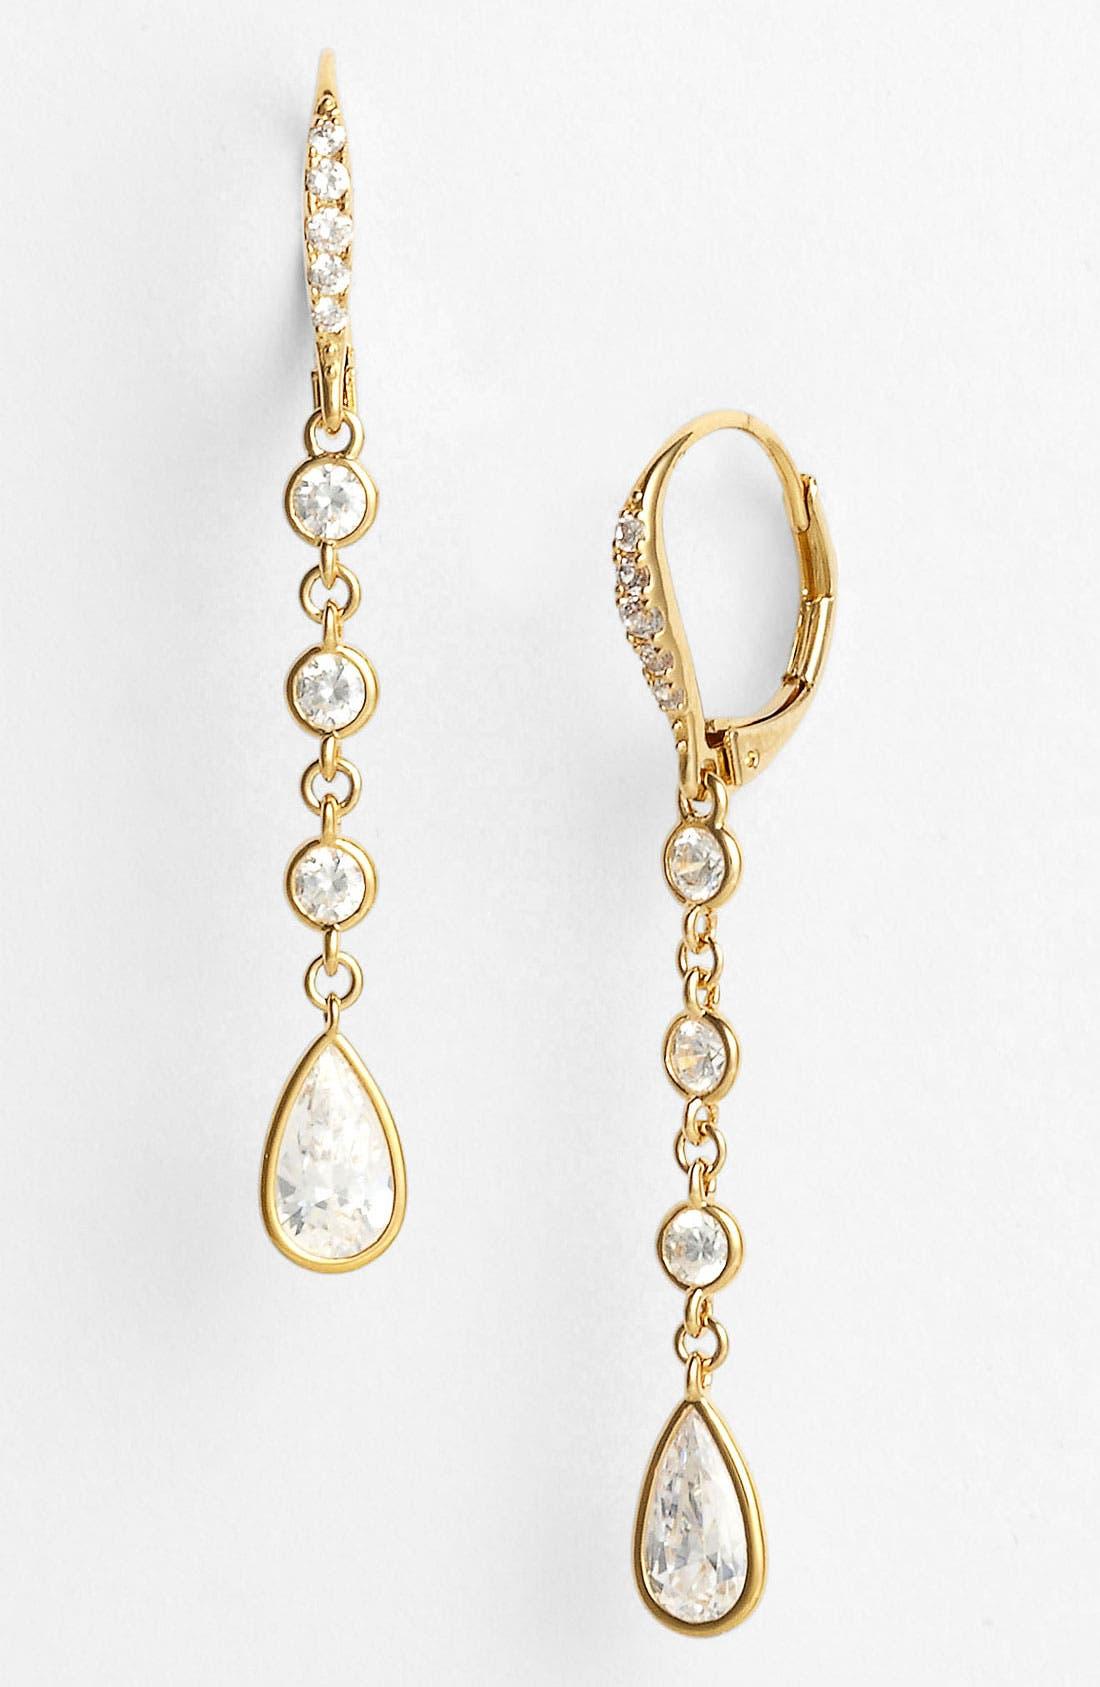 Main Image - Nadri Round & Teardrop Cubic Zirconia Earrings (Nordstrom Exclusive)